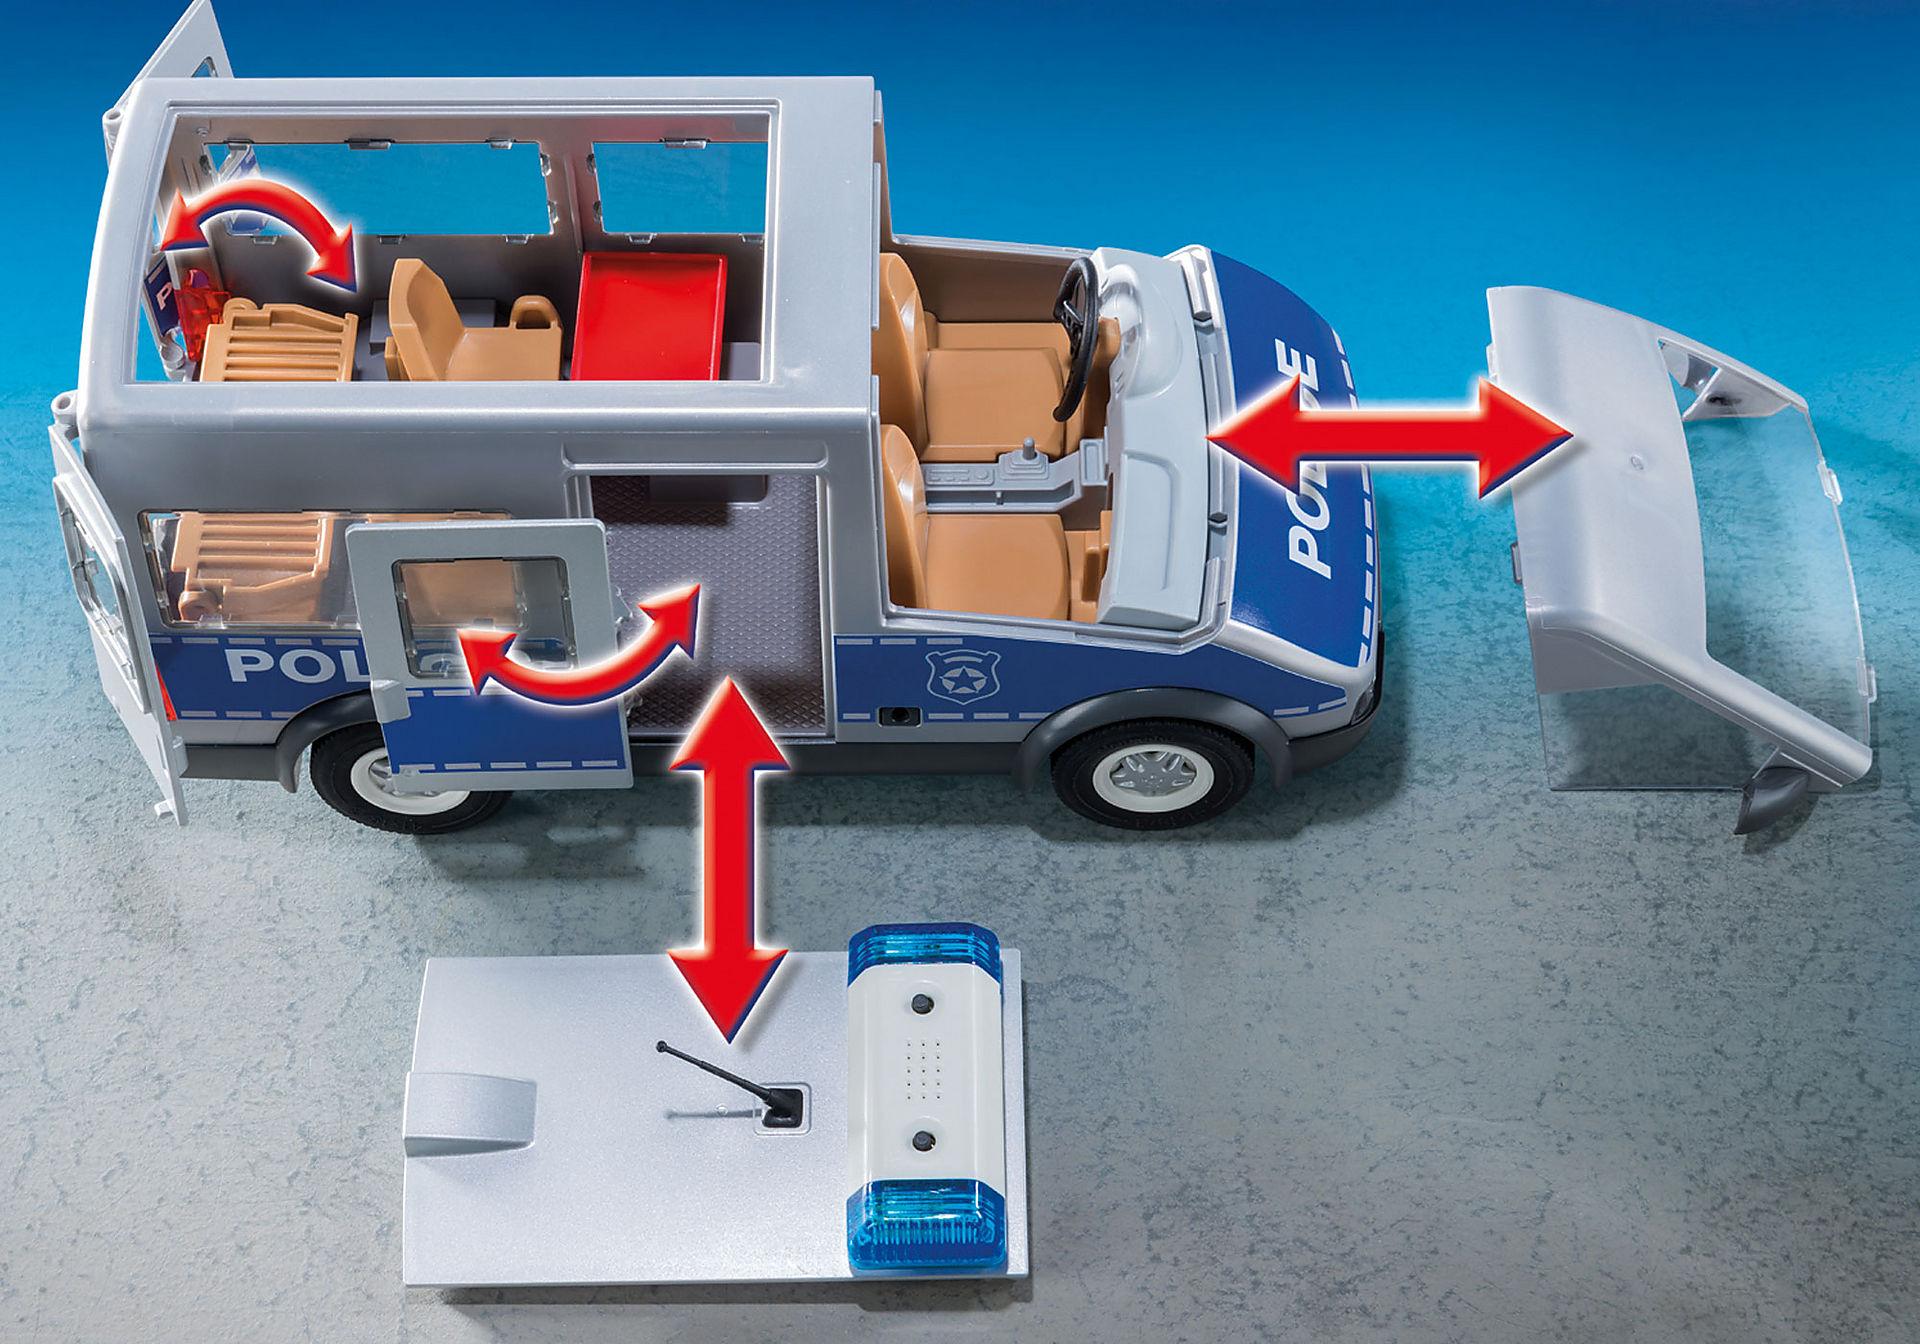 http://media.playmobil.com/i/playmobil/9236_product_extra3/Polizeibus mit Straßensperre